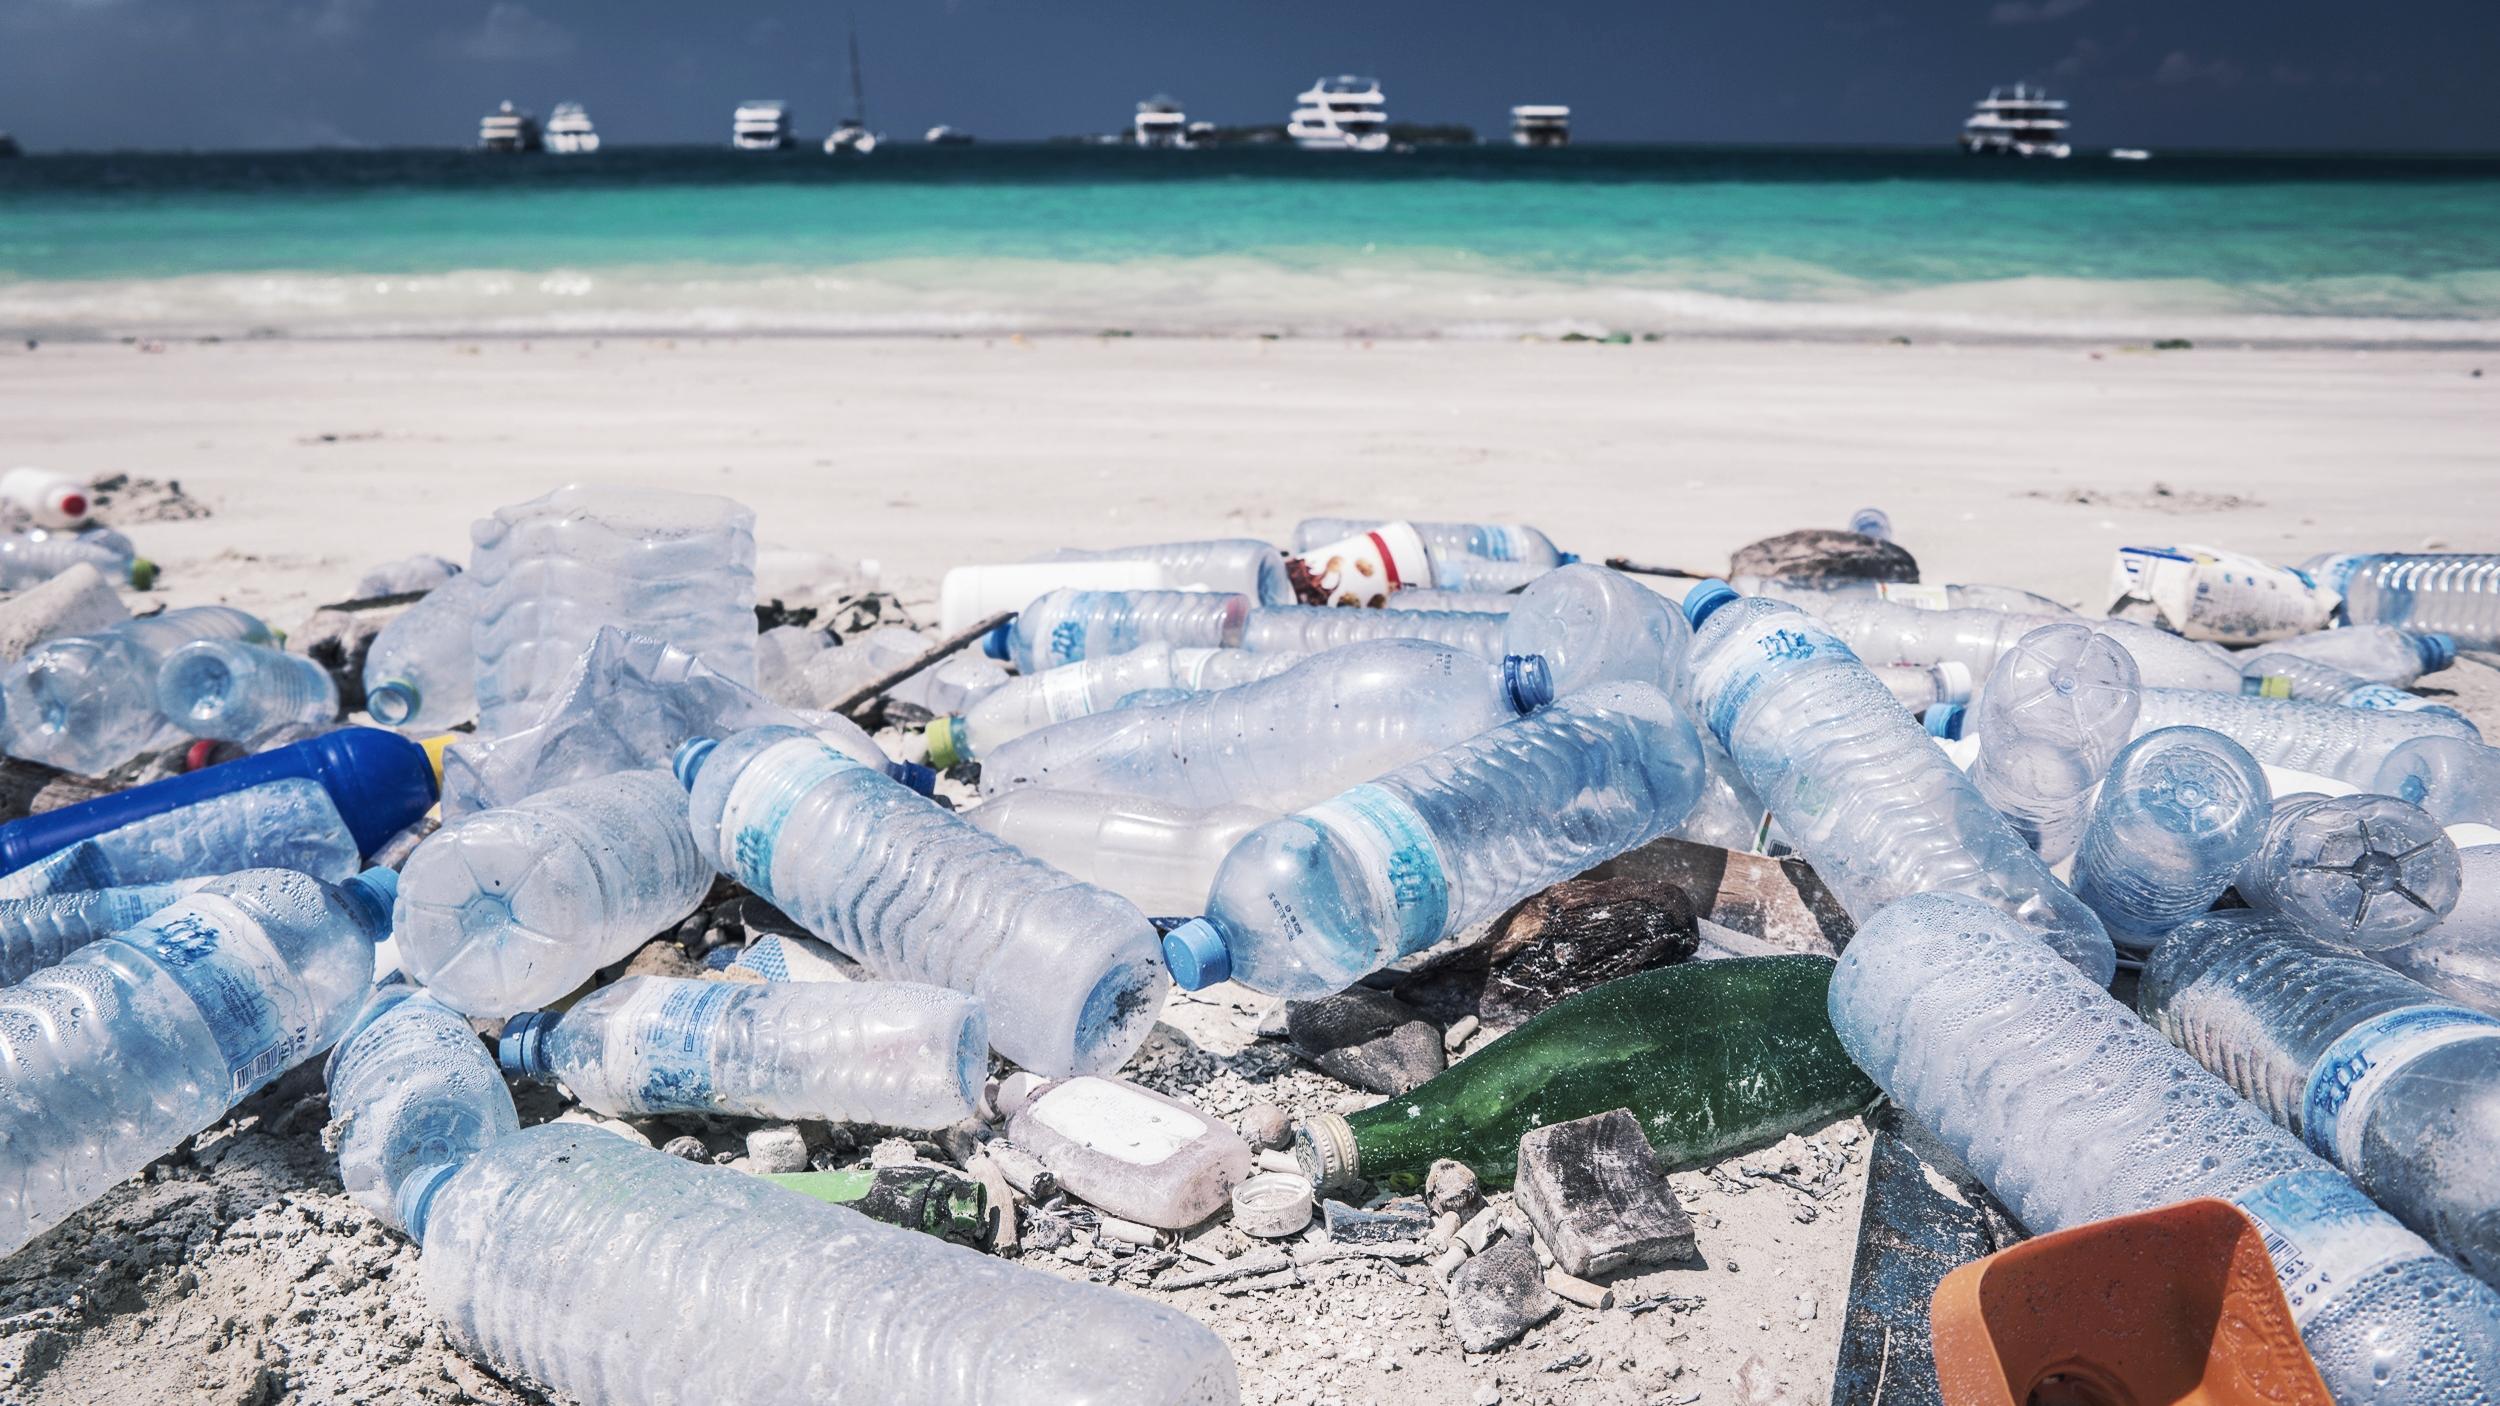 christianmiler_parley_maldives2-2.jpg